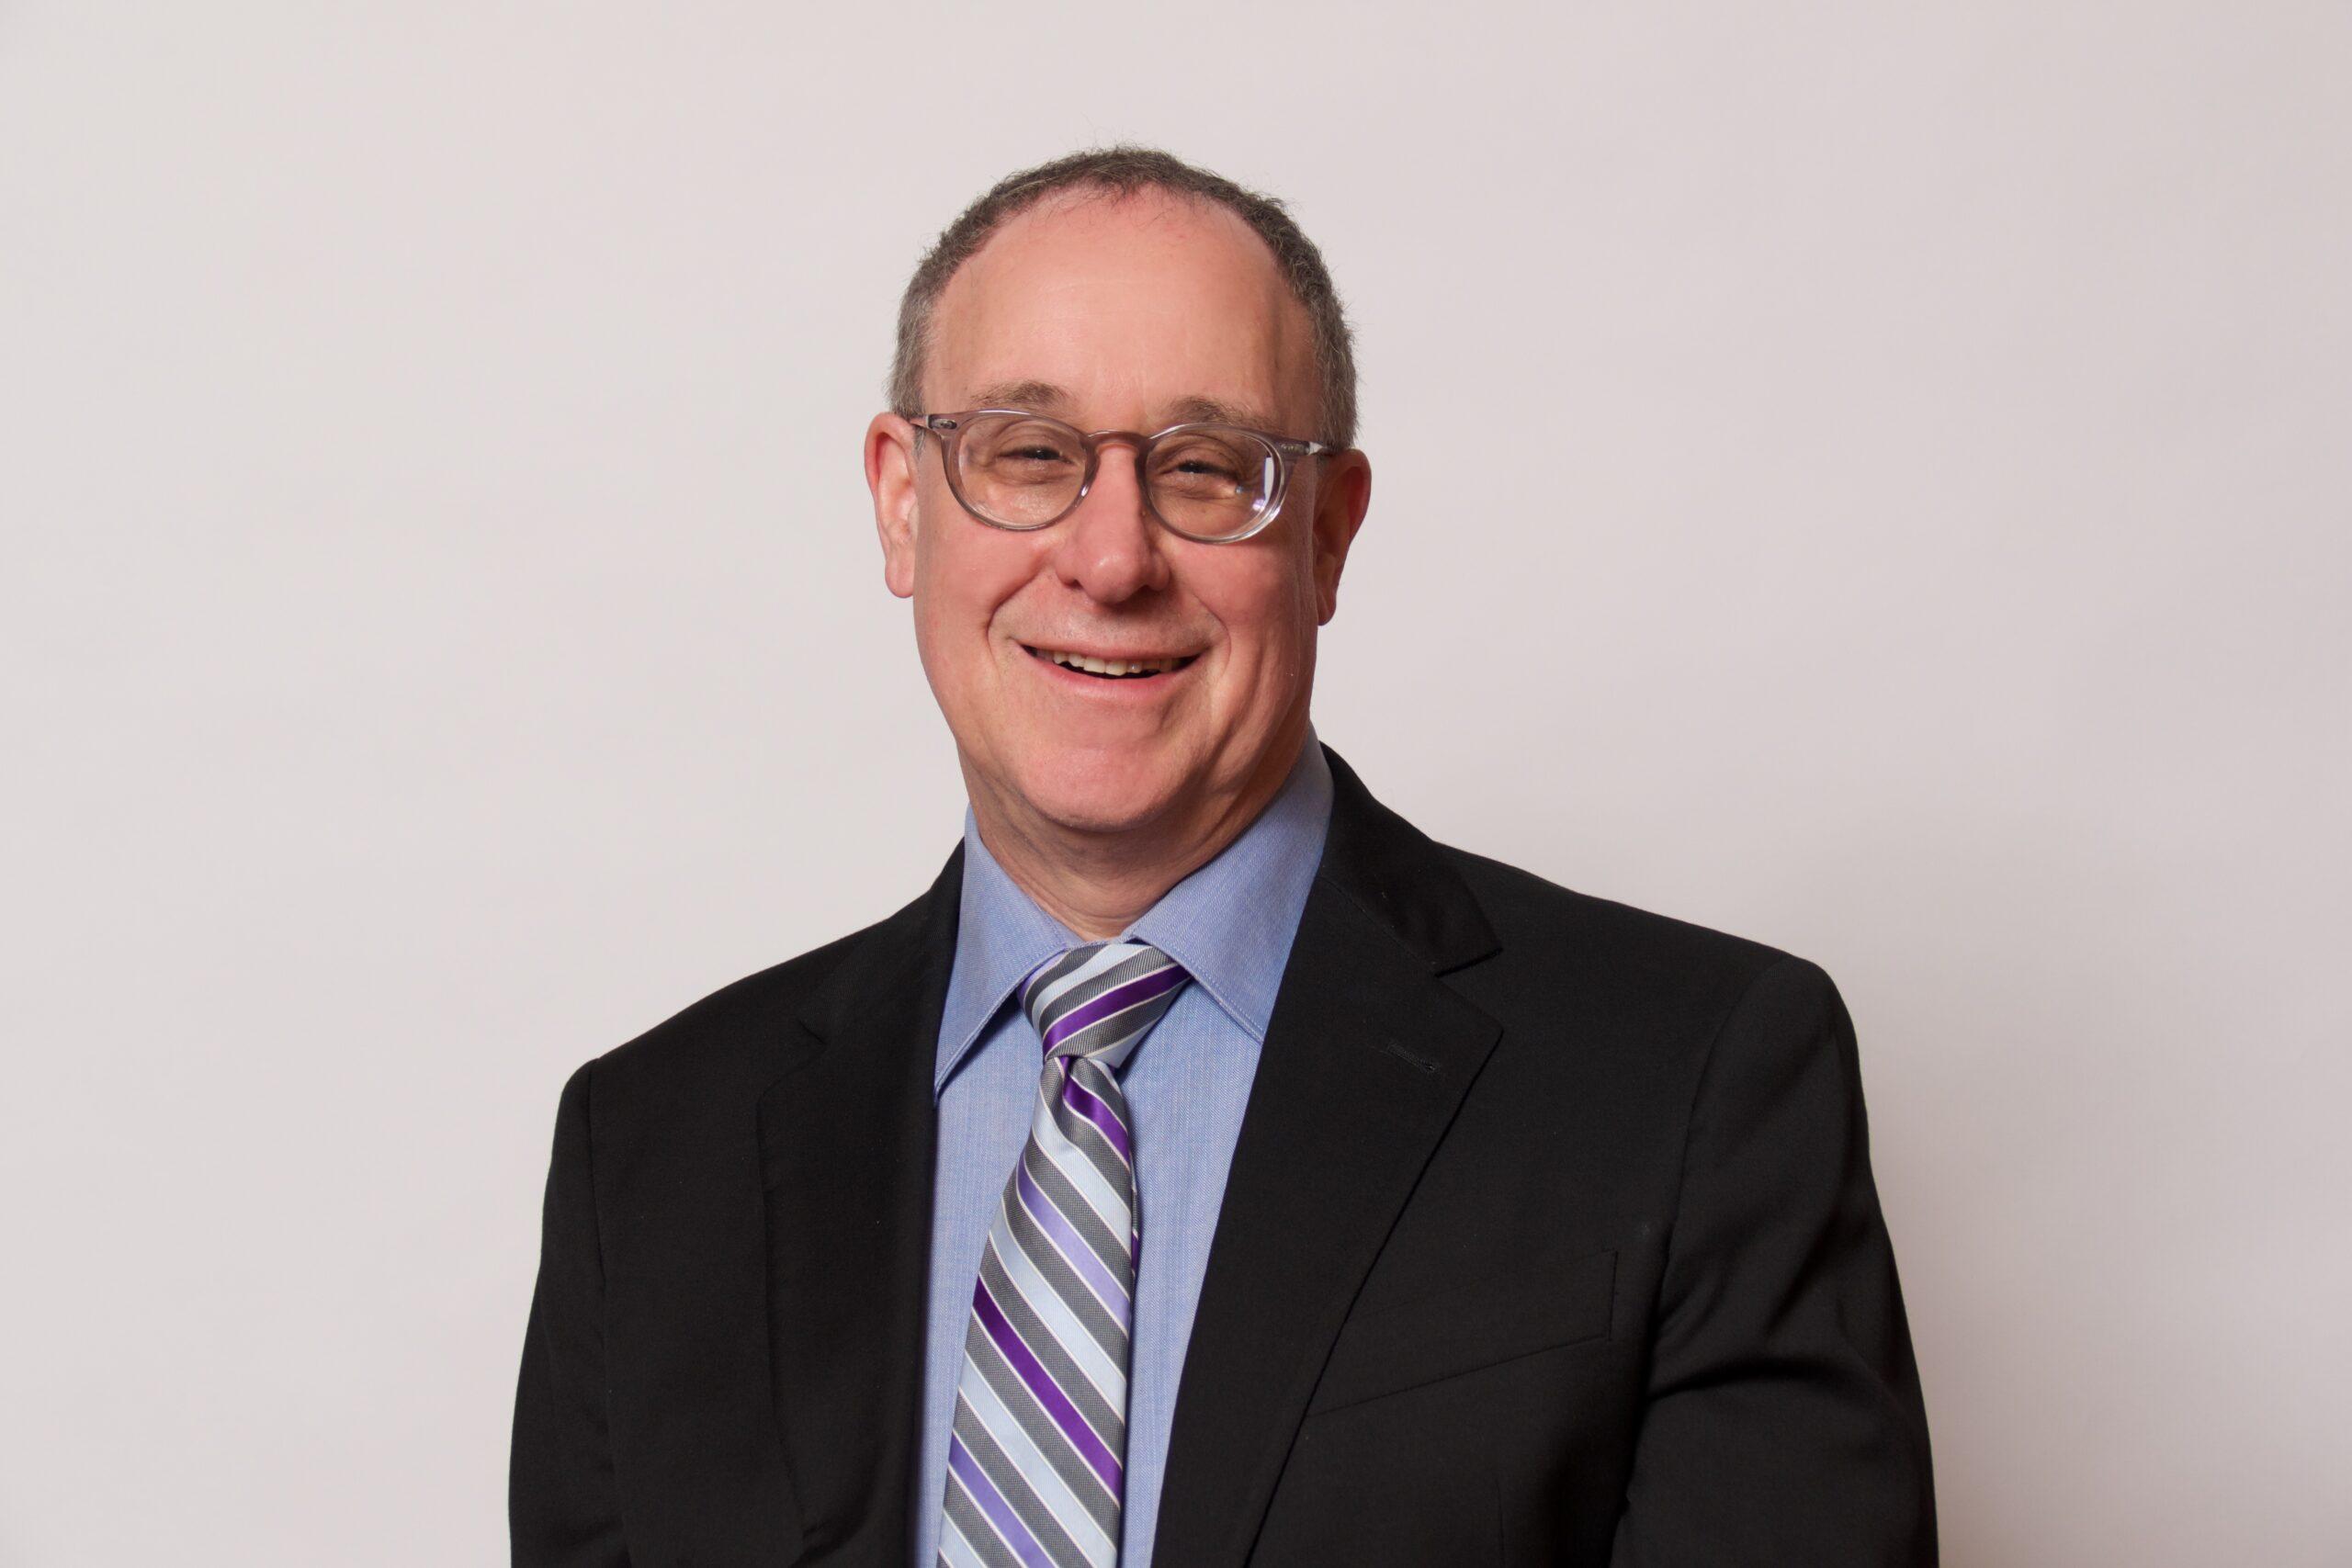 Dr. Jeffrey Ptak